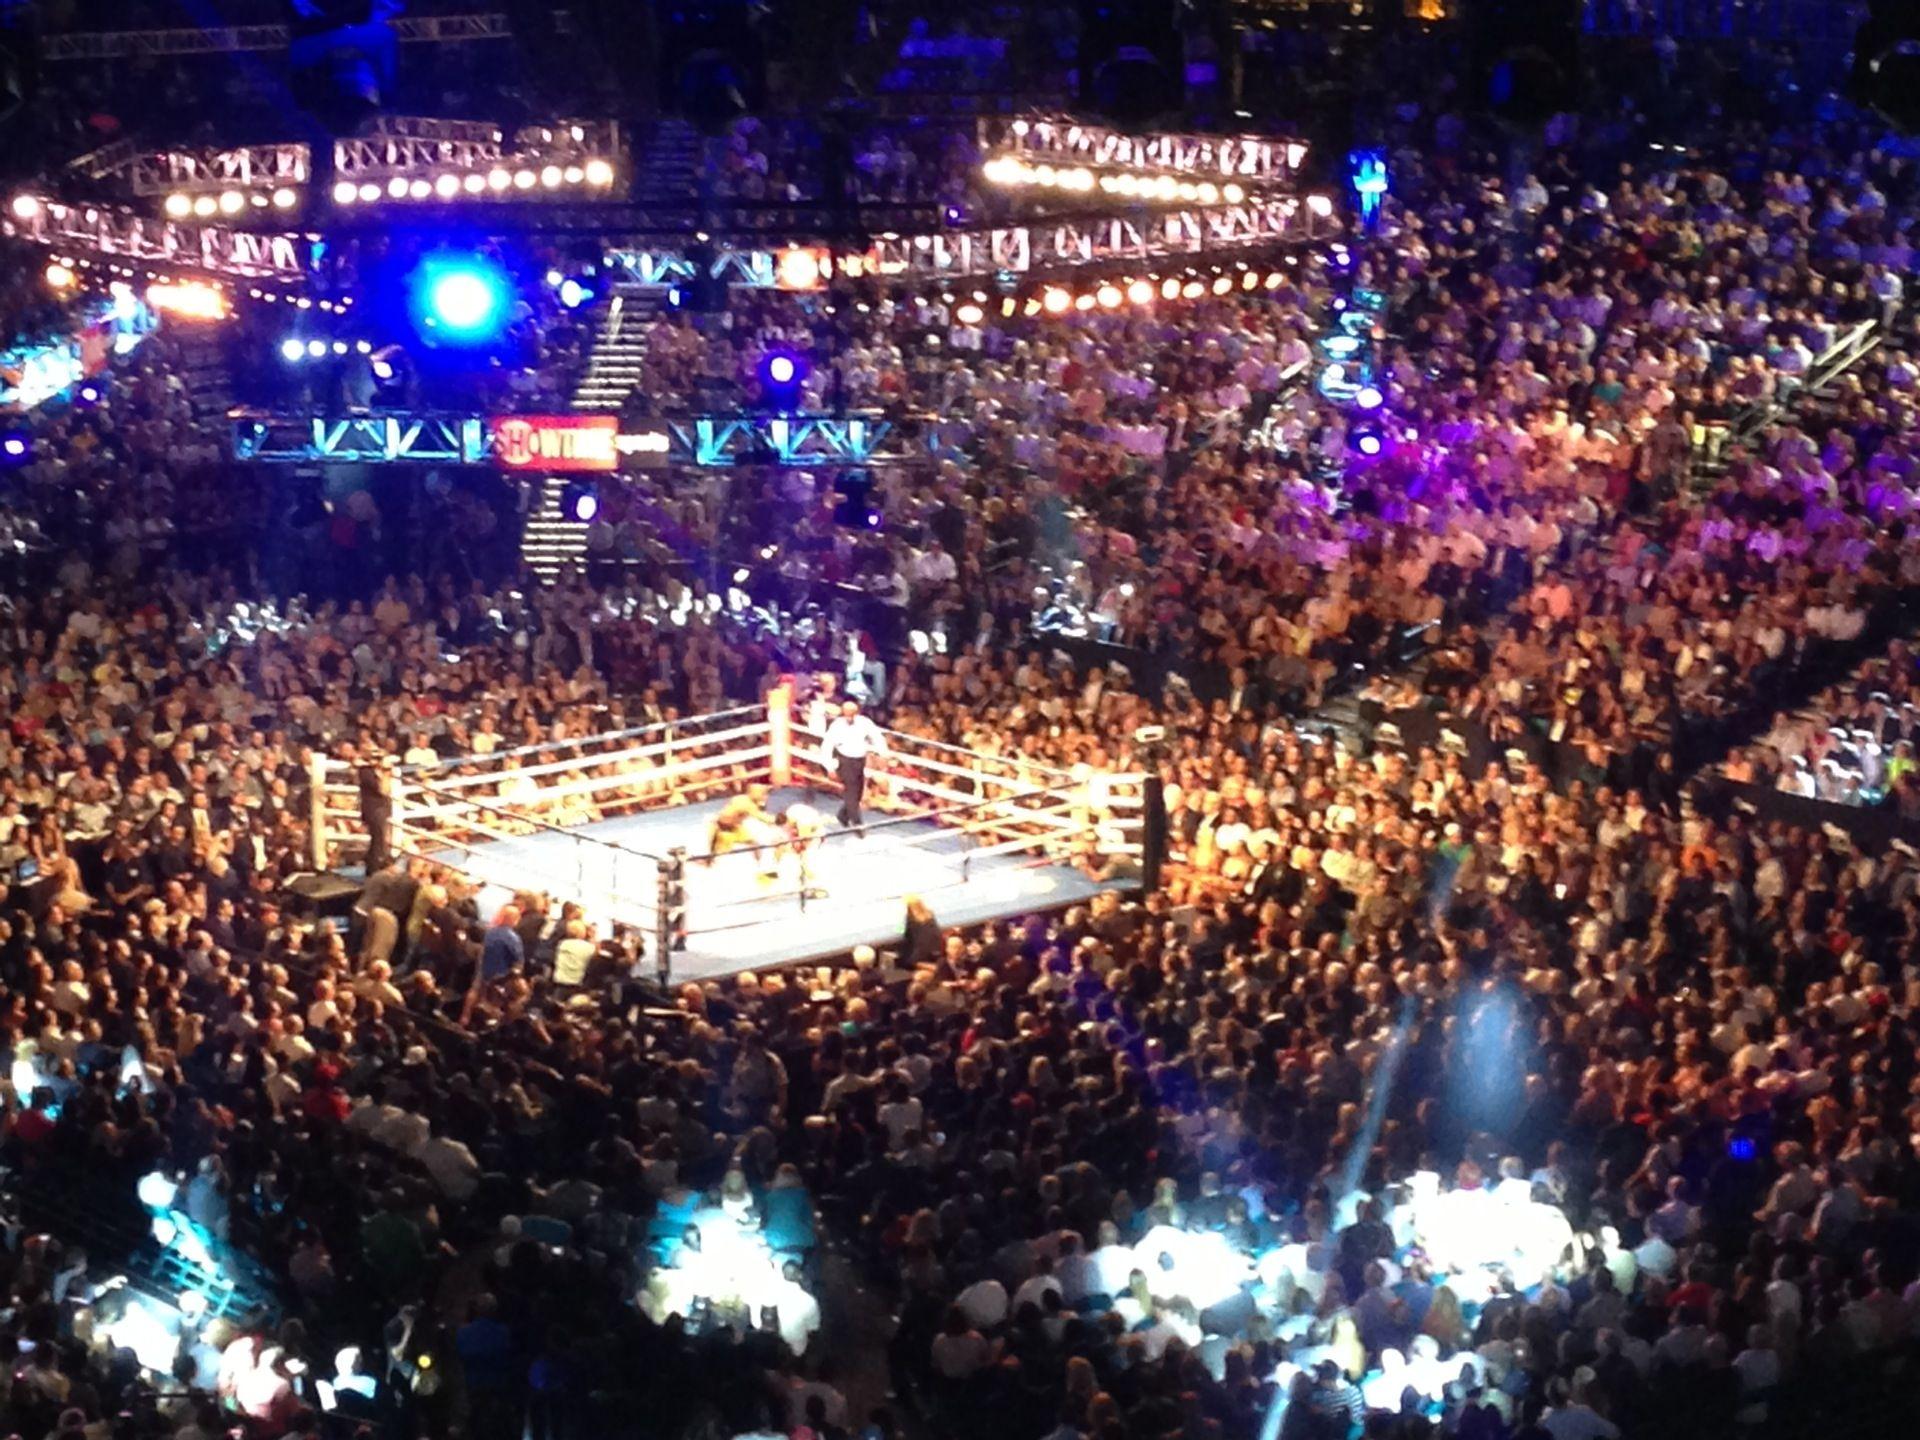 Mgm Grand Garden Arena Mgm Grand Garden Arena Mgm Grand Las Vegas Mgm